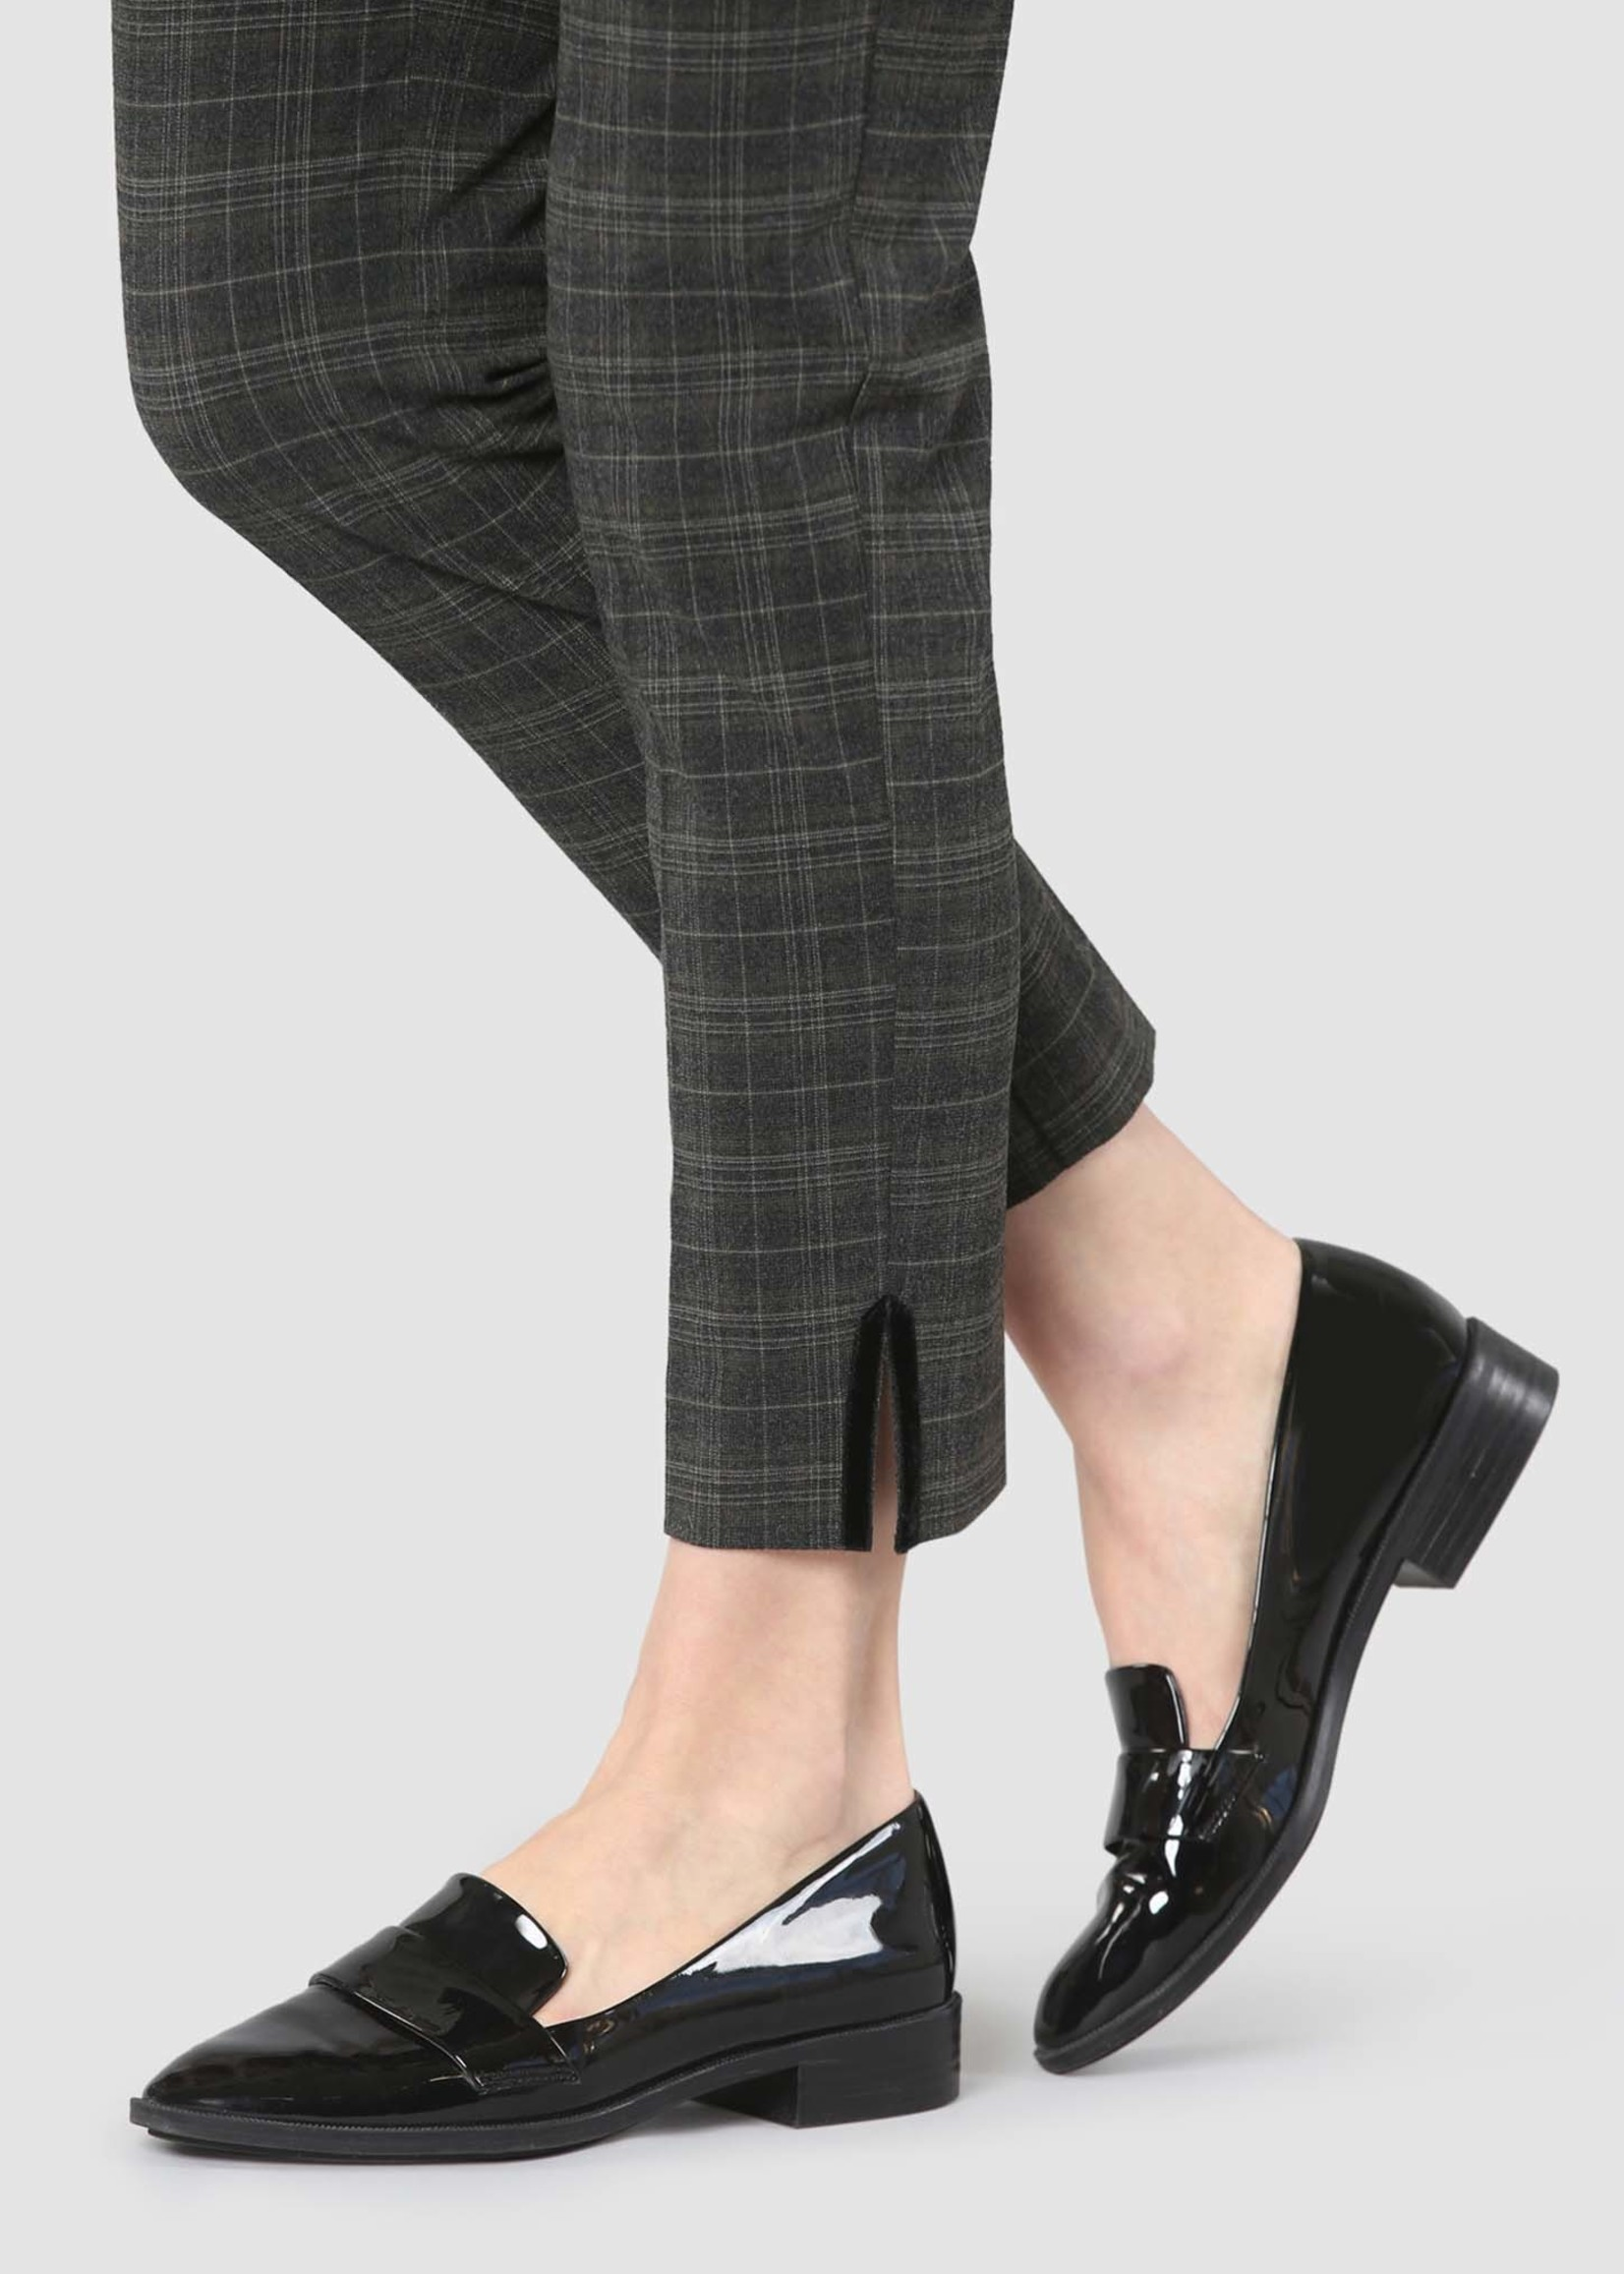 Lisette L Lisette L Plaid Ankle Pant - Westport